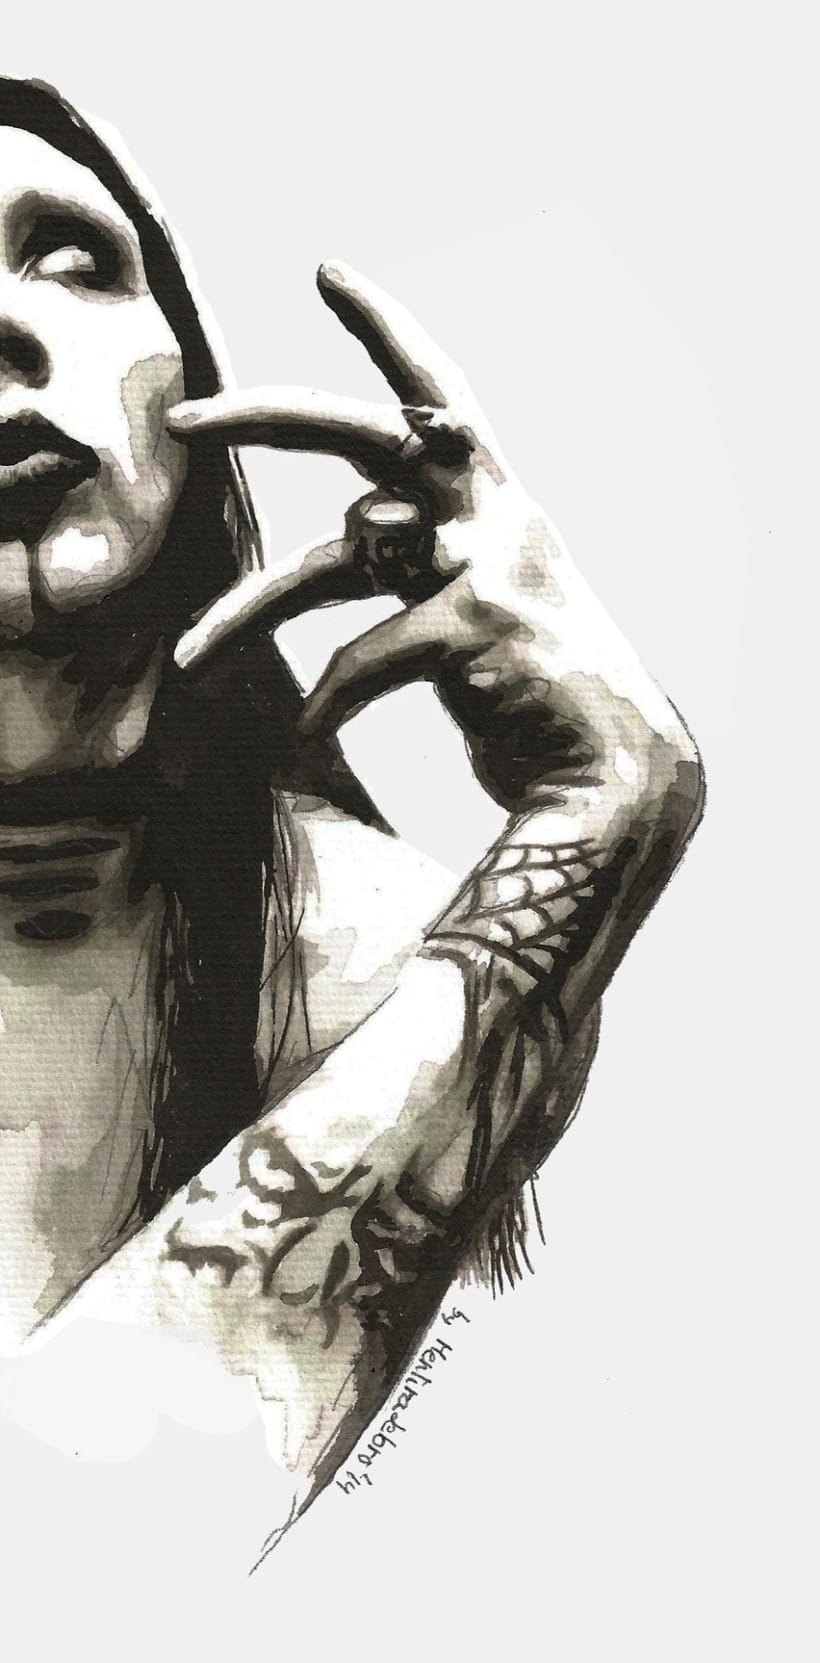 Inspiration (Portrait of Marilyn Manson) 1